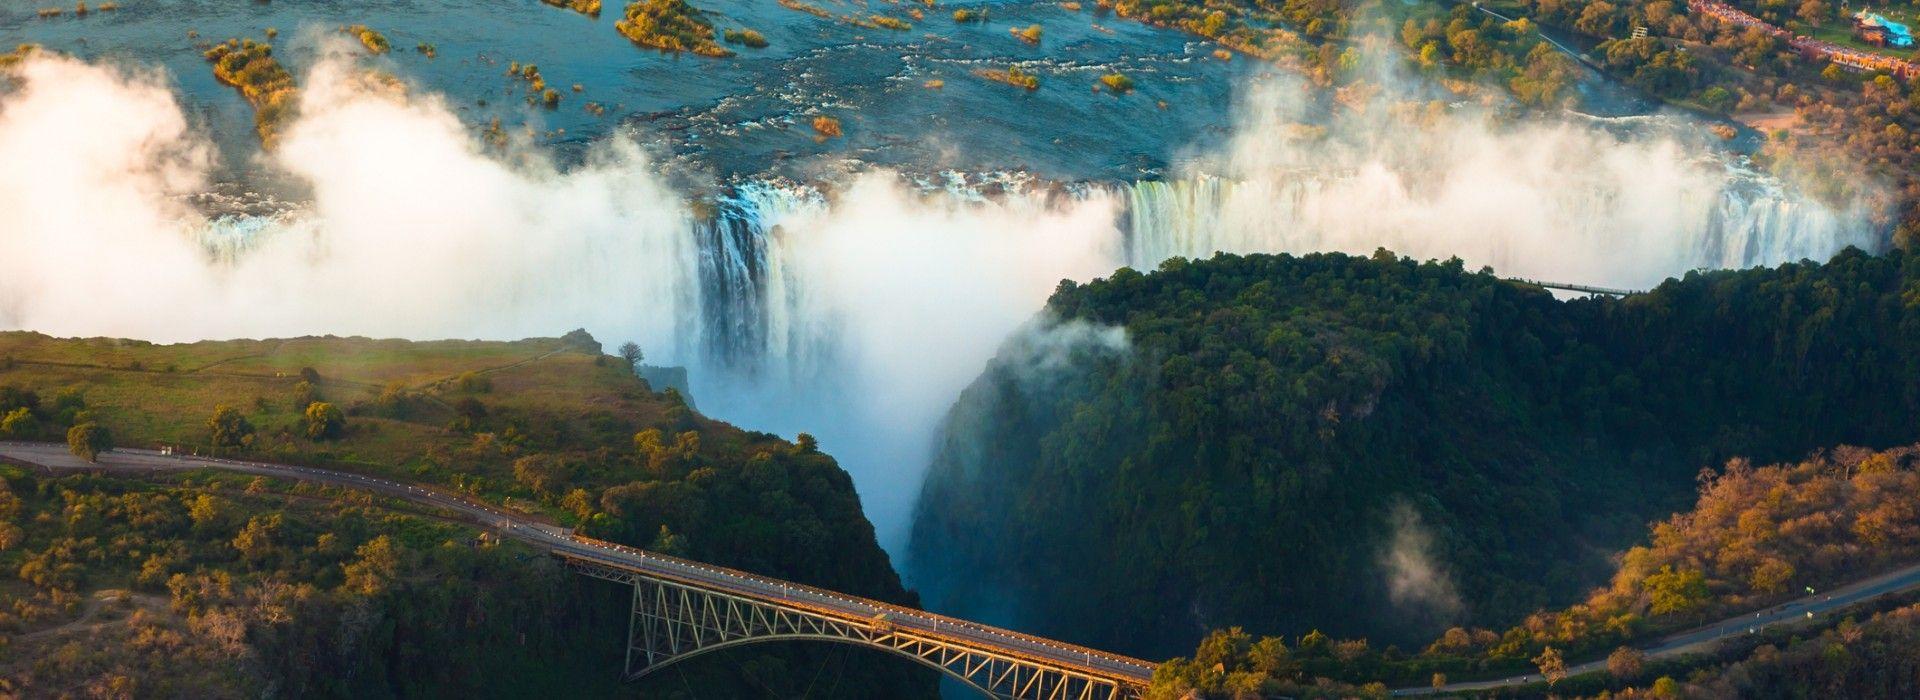 Natural landmarks sightseeing Tours in Lower Zambezi National Park